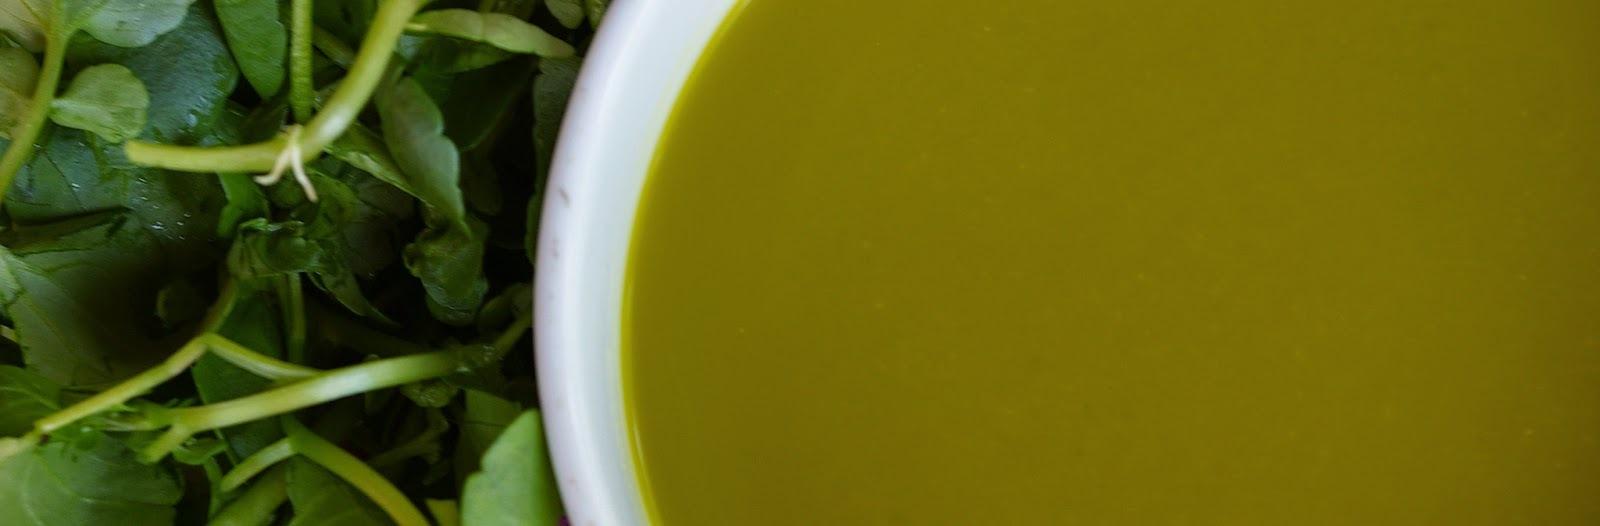 Sopa rápida de agrião (vegan)